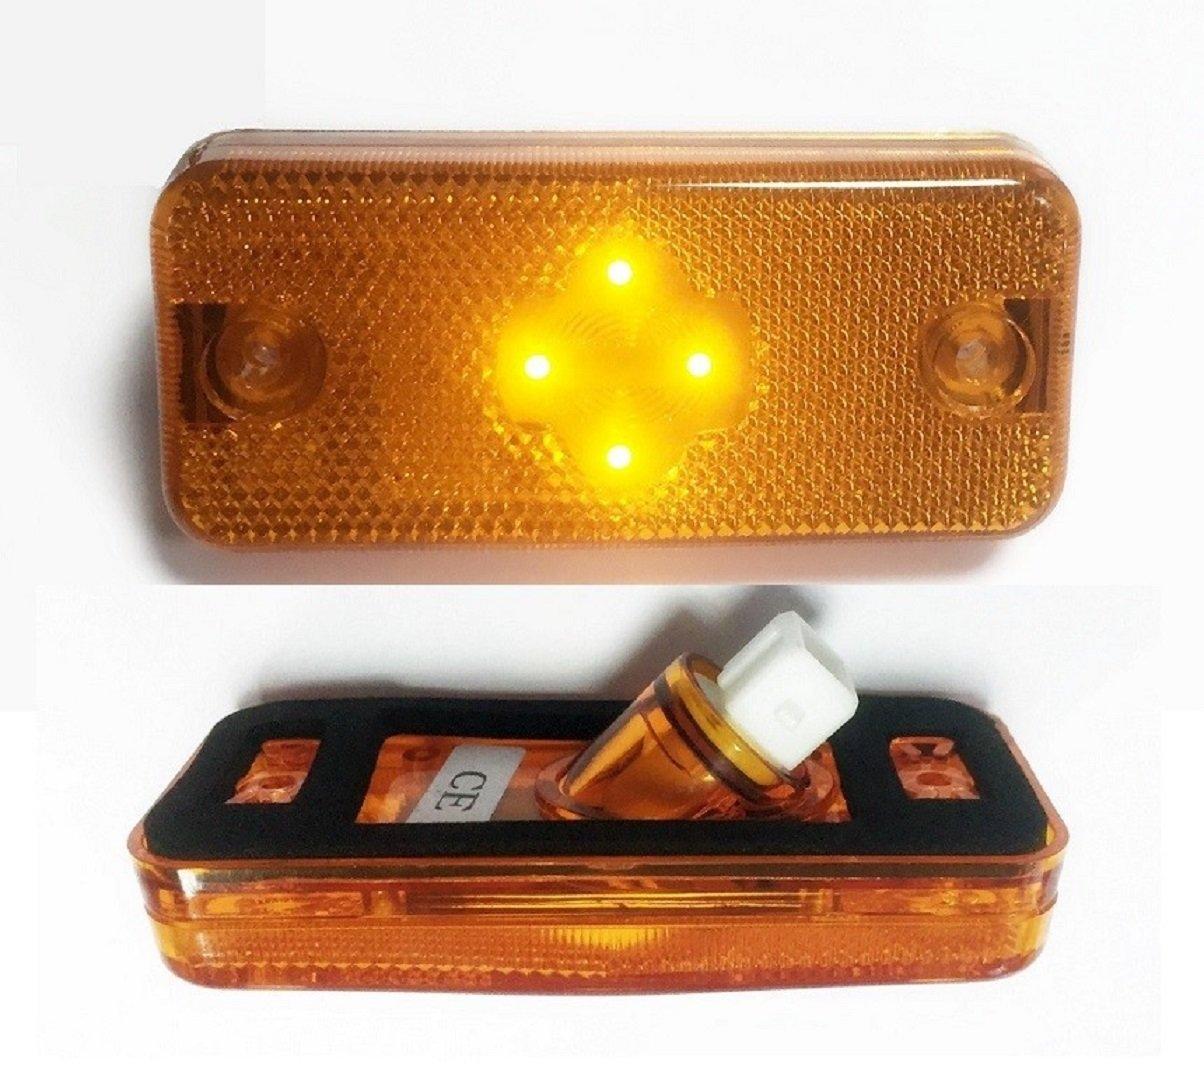 2x LED Blinker orange Seitenmarkierungsleuchten fü r FE2, FM2, DUCATO 2006>, Boxer 2006>, Midlum, Relay Premium, Kerax, Magnum VNES